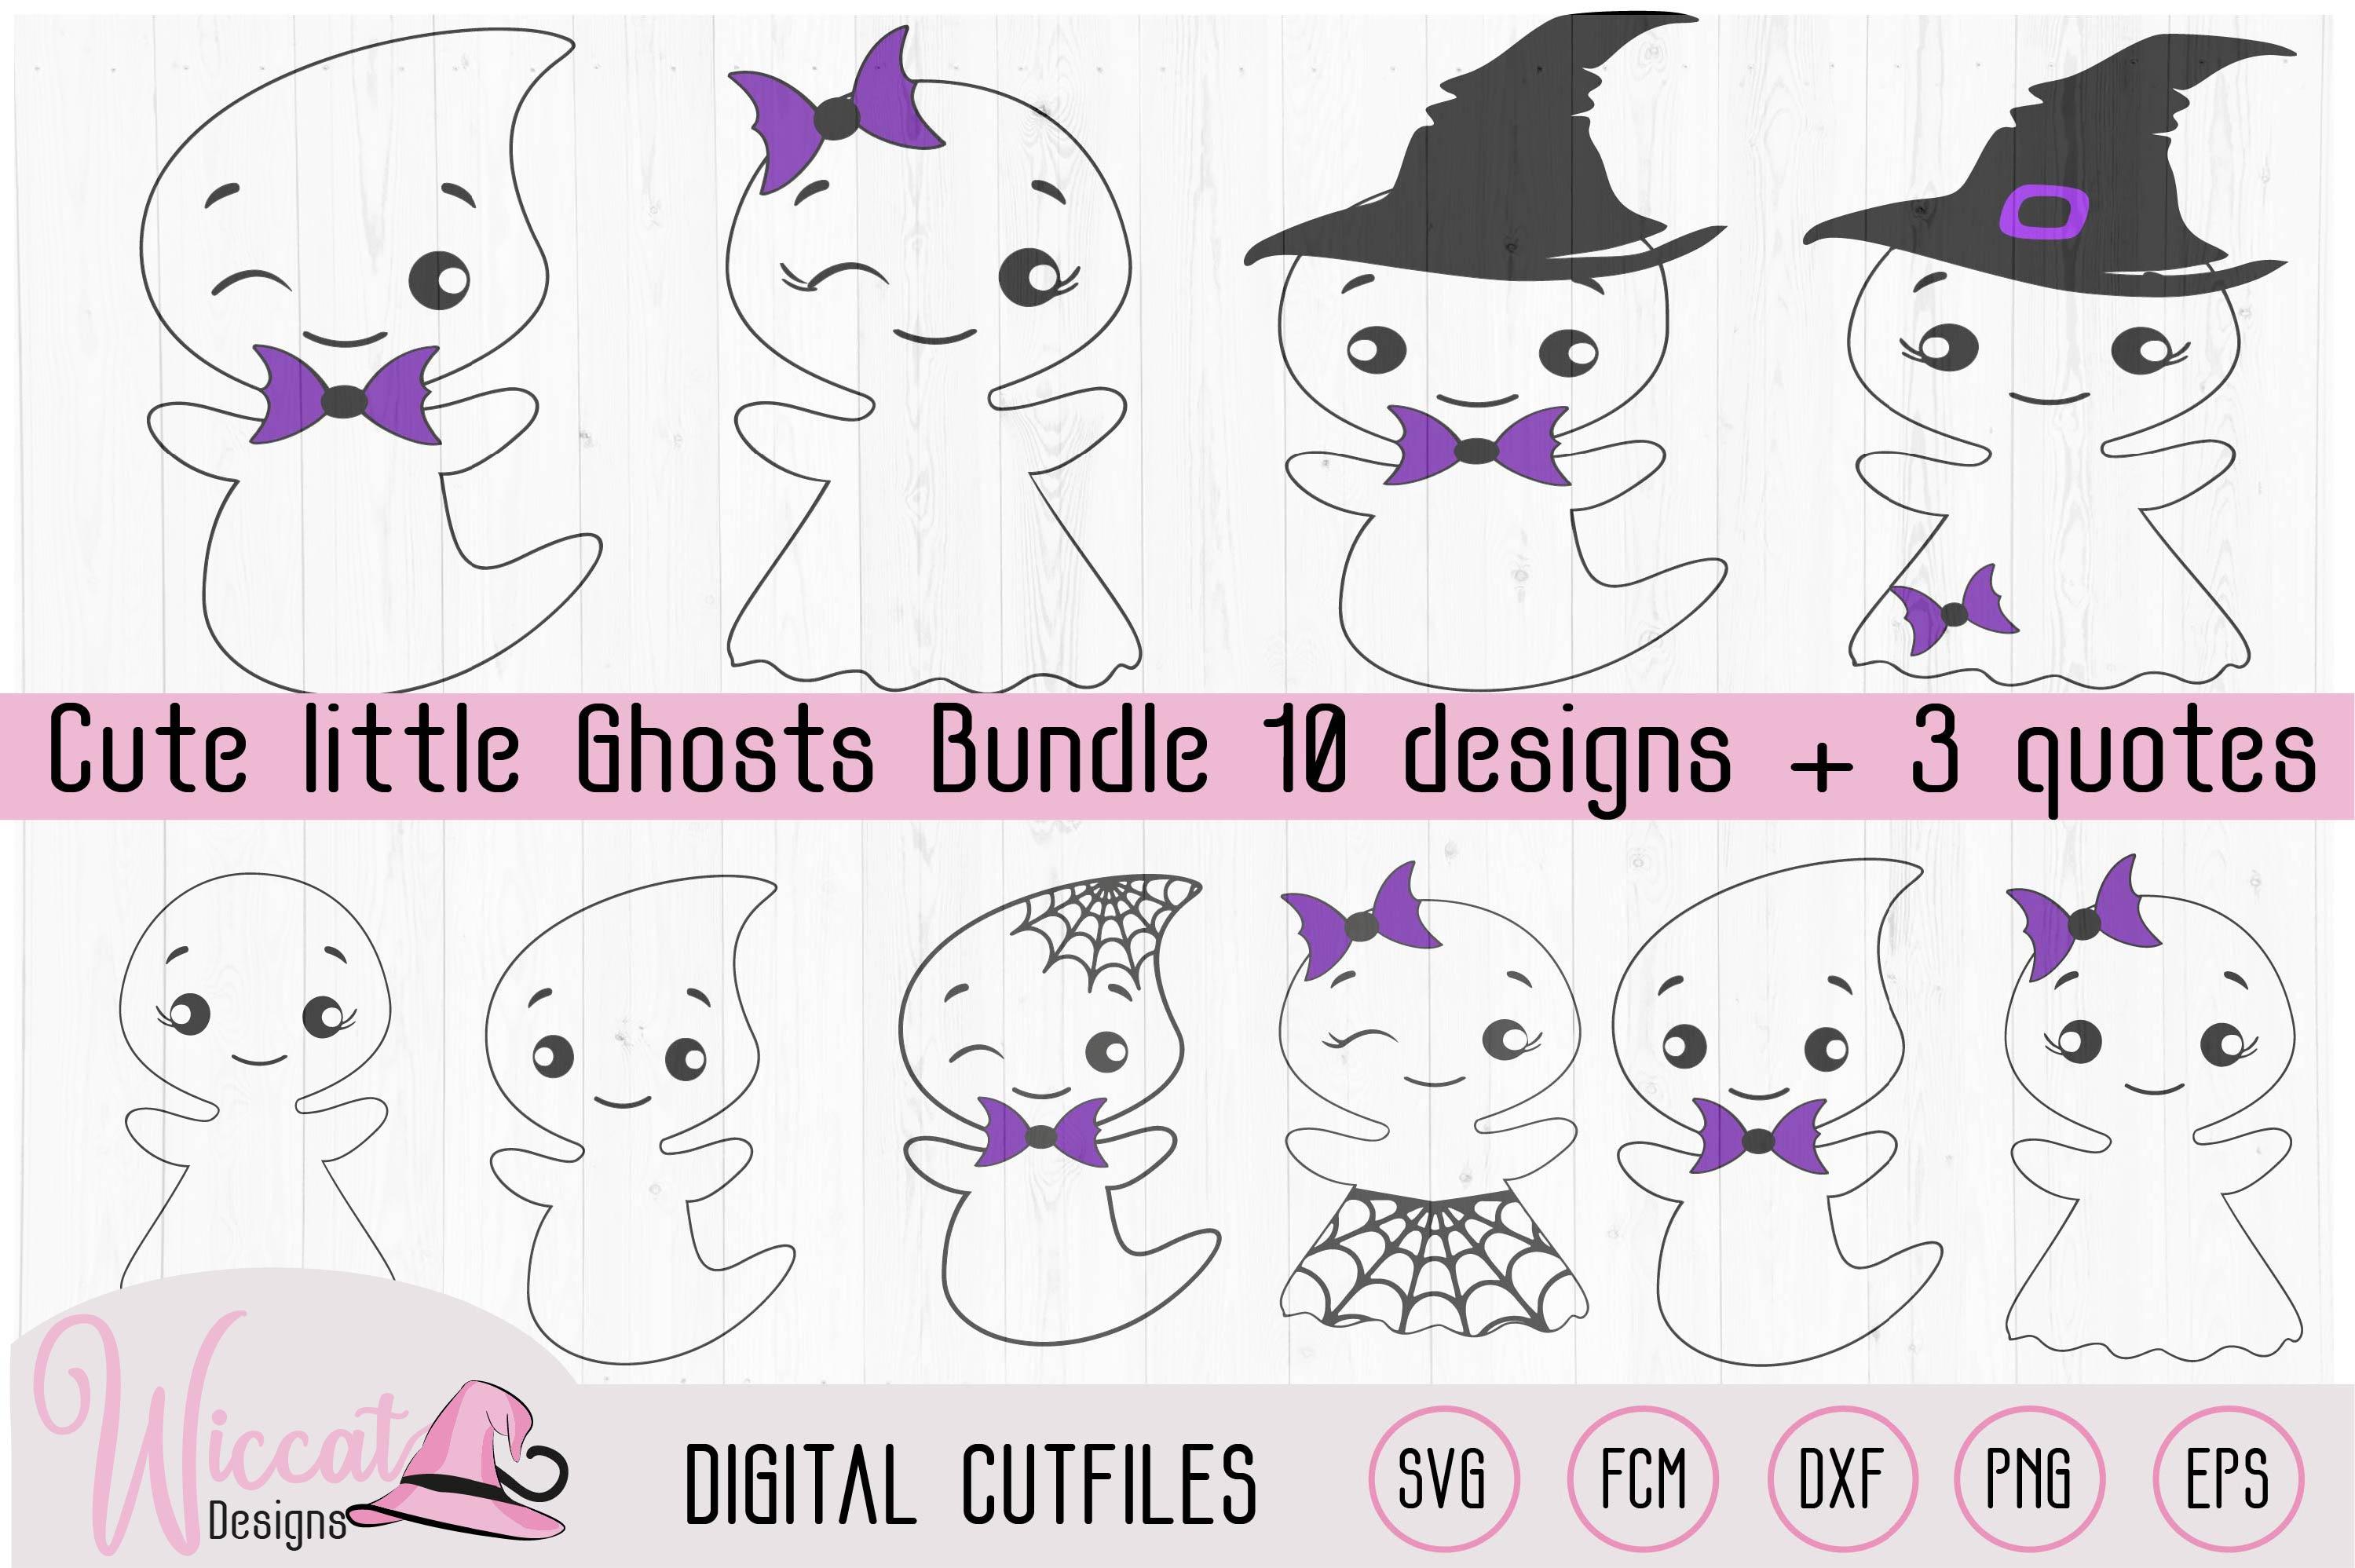 Cute little ghost bundle, scanncut, cricut, vinyl craft example image 3